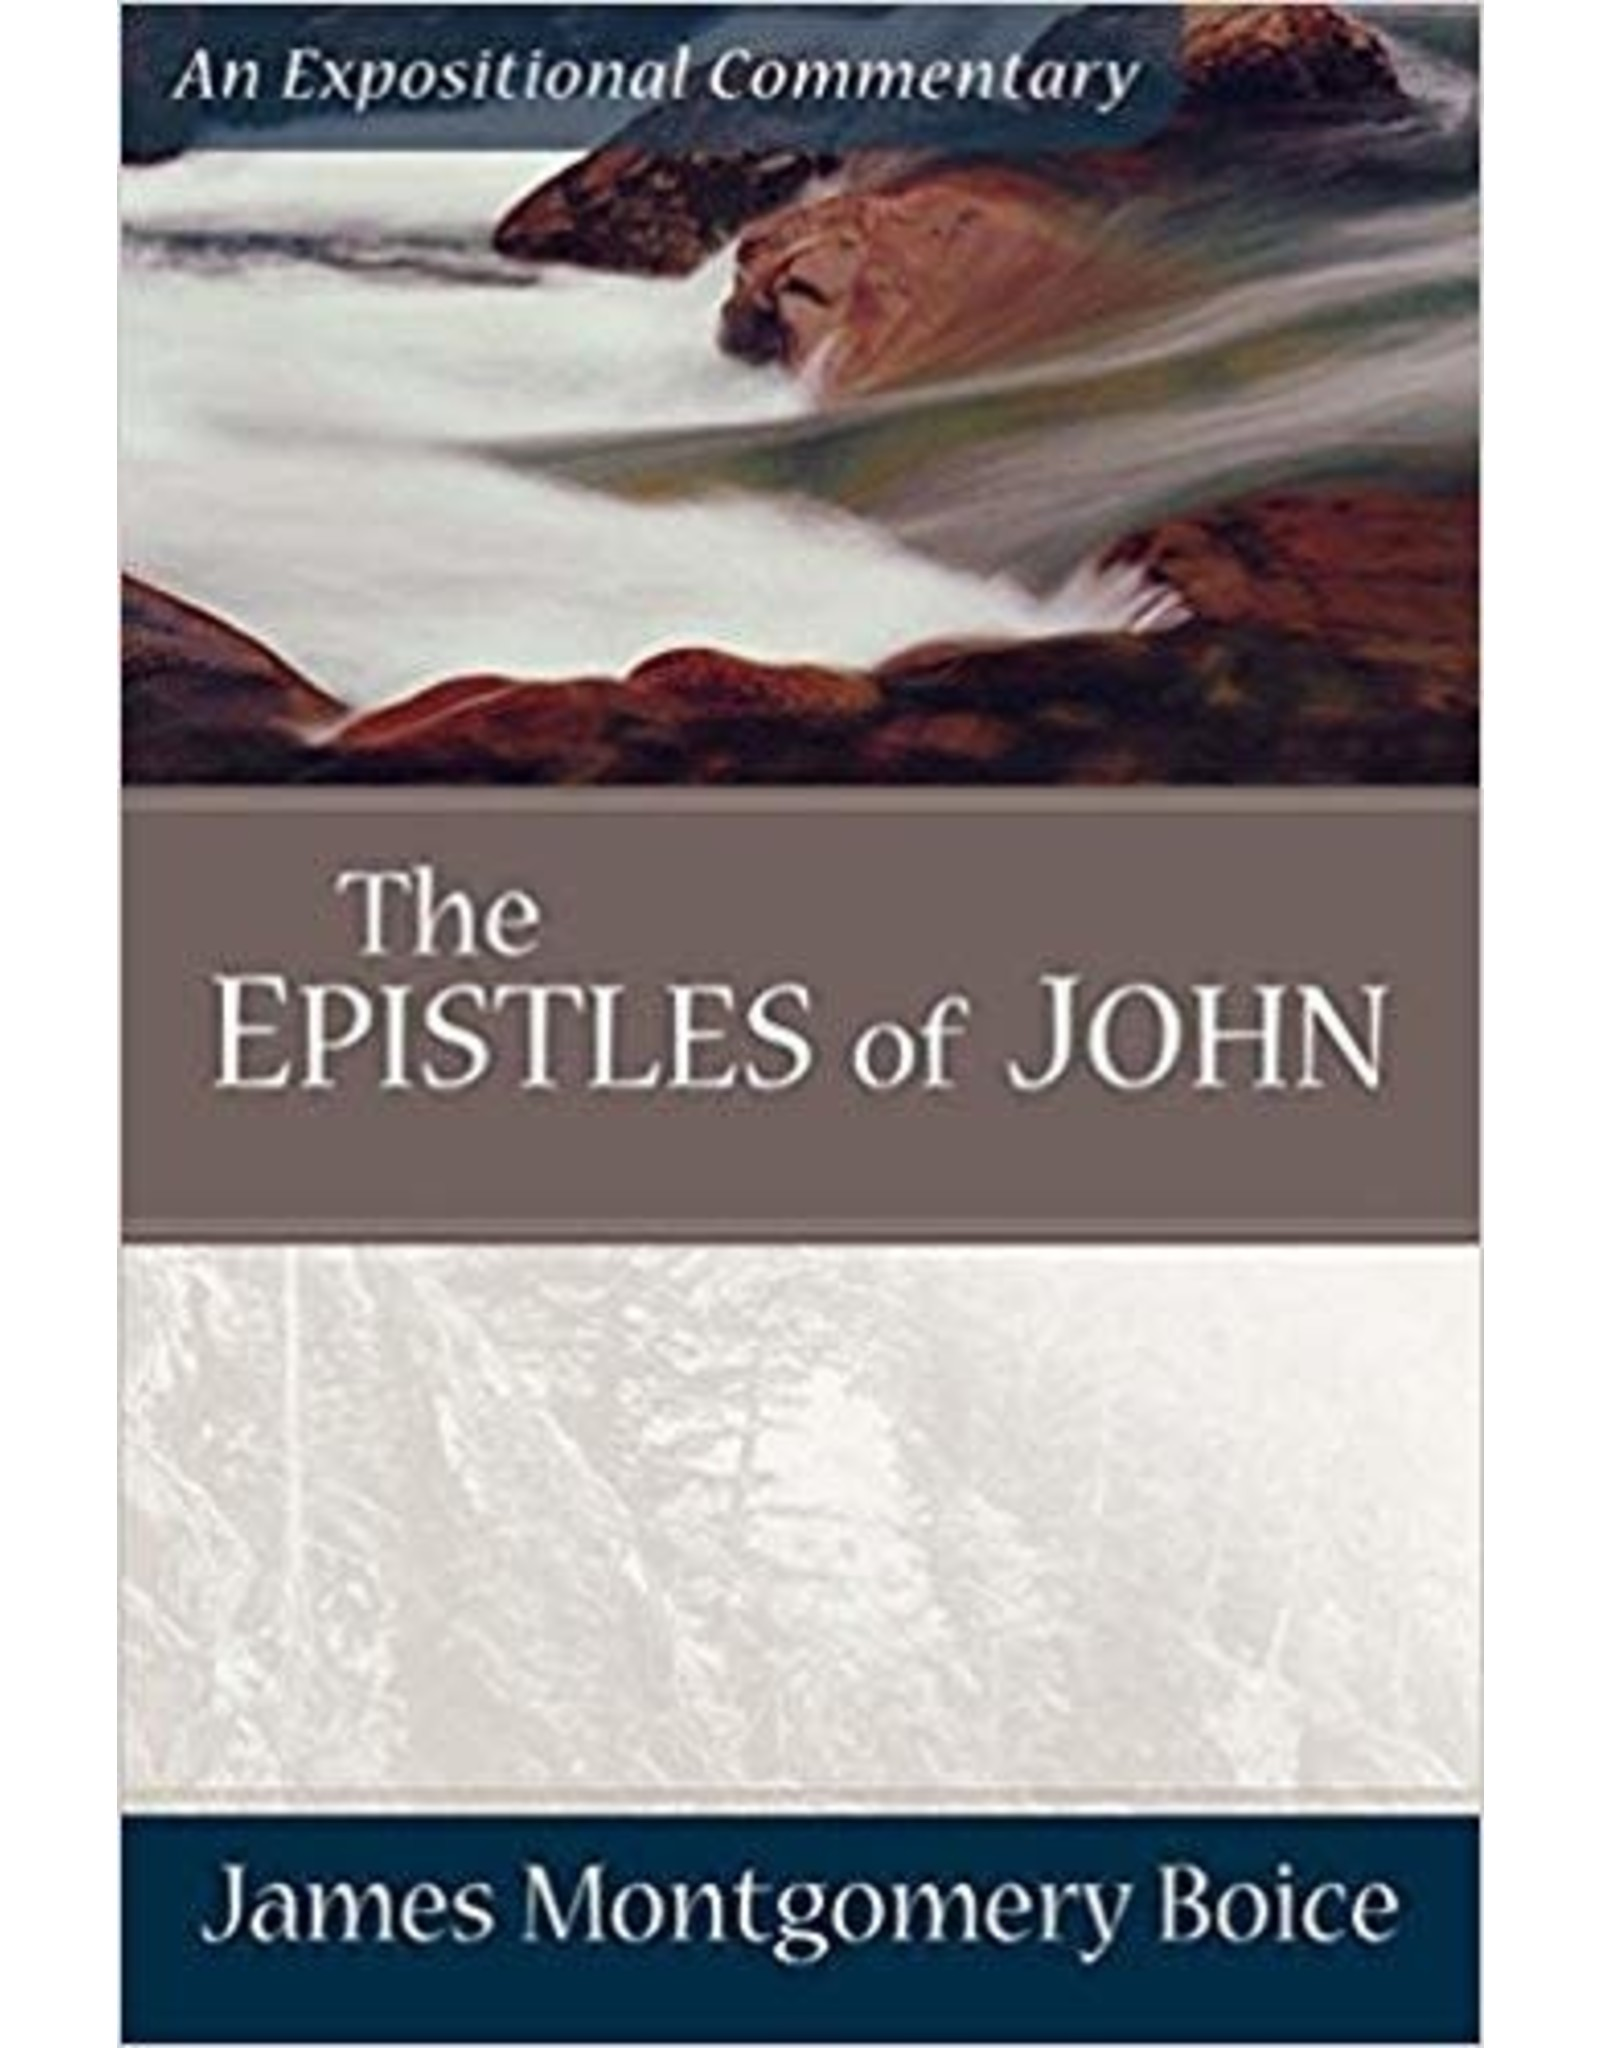 Boice The Epistles of John: An Expositional Commentary